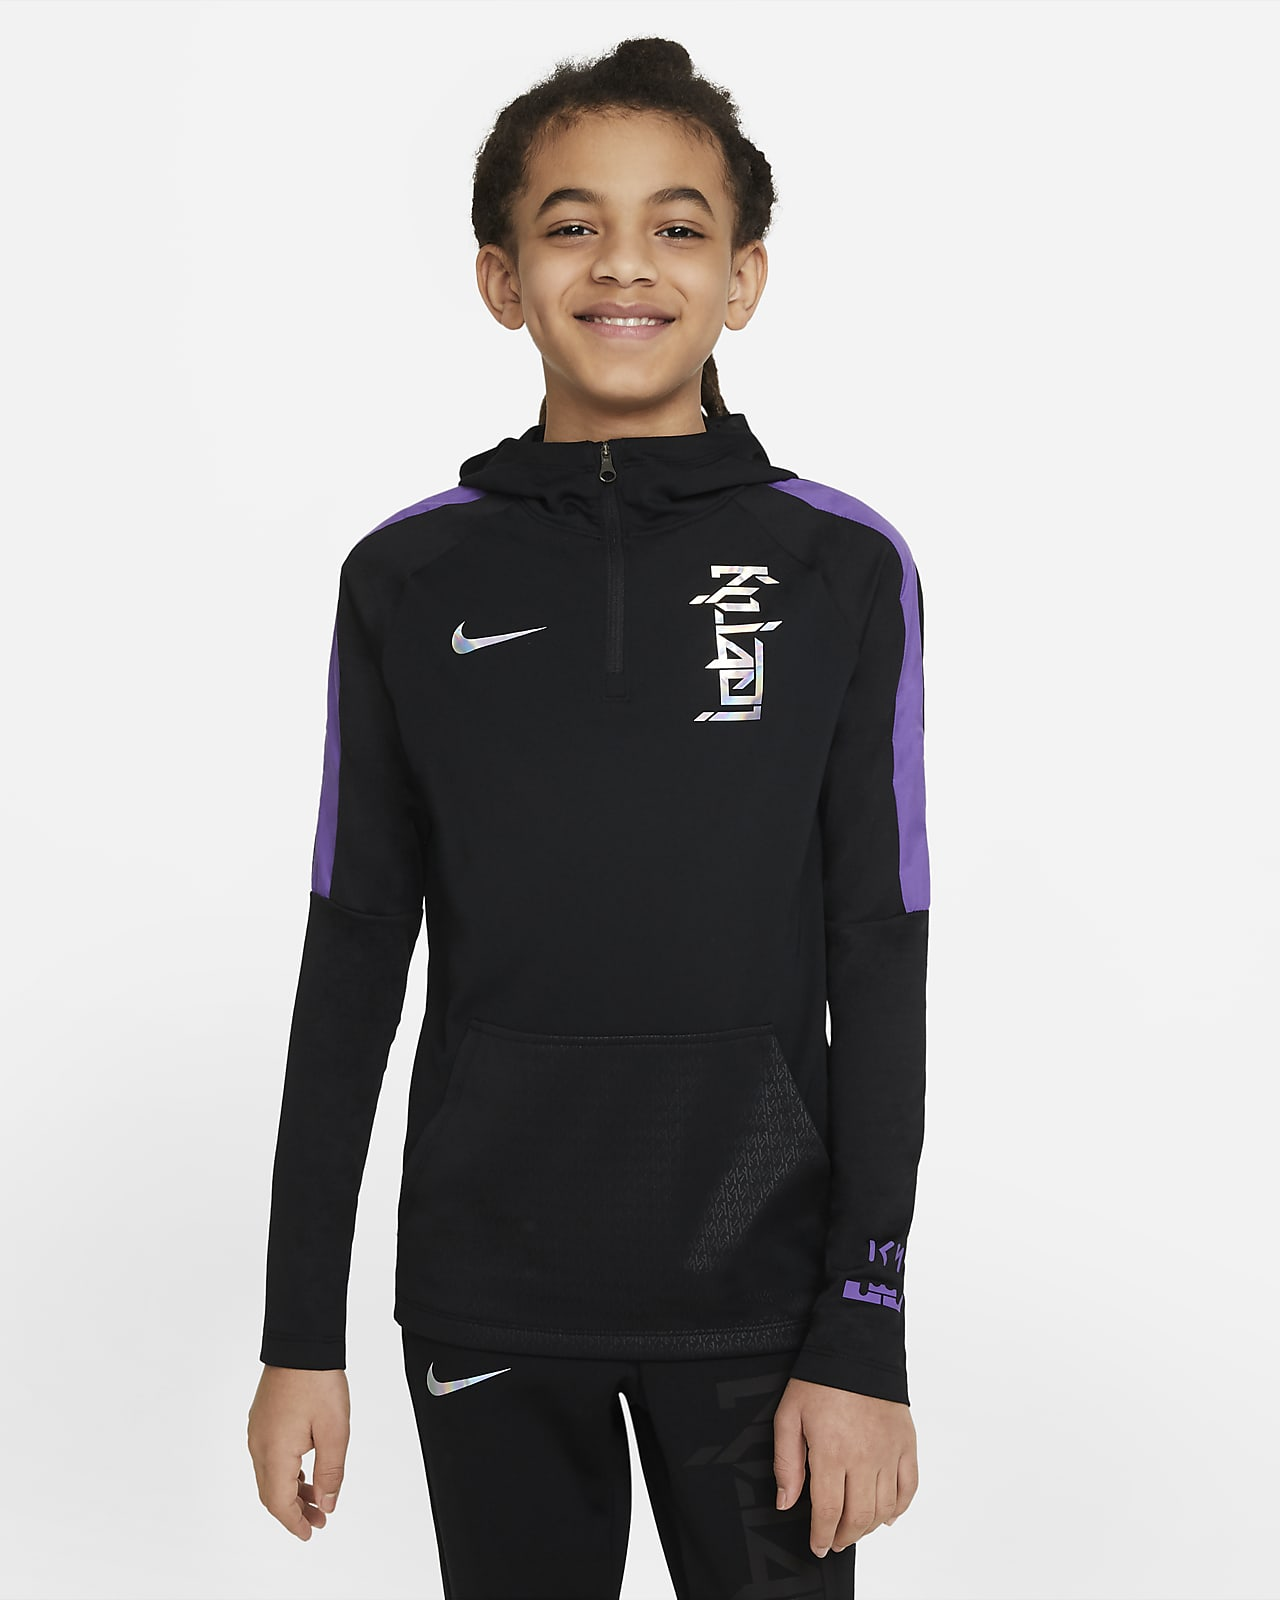 Nike Dri-FIT Kylian Mbappé Older Kids' Football Hoodie